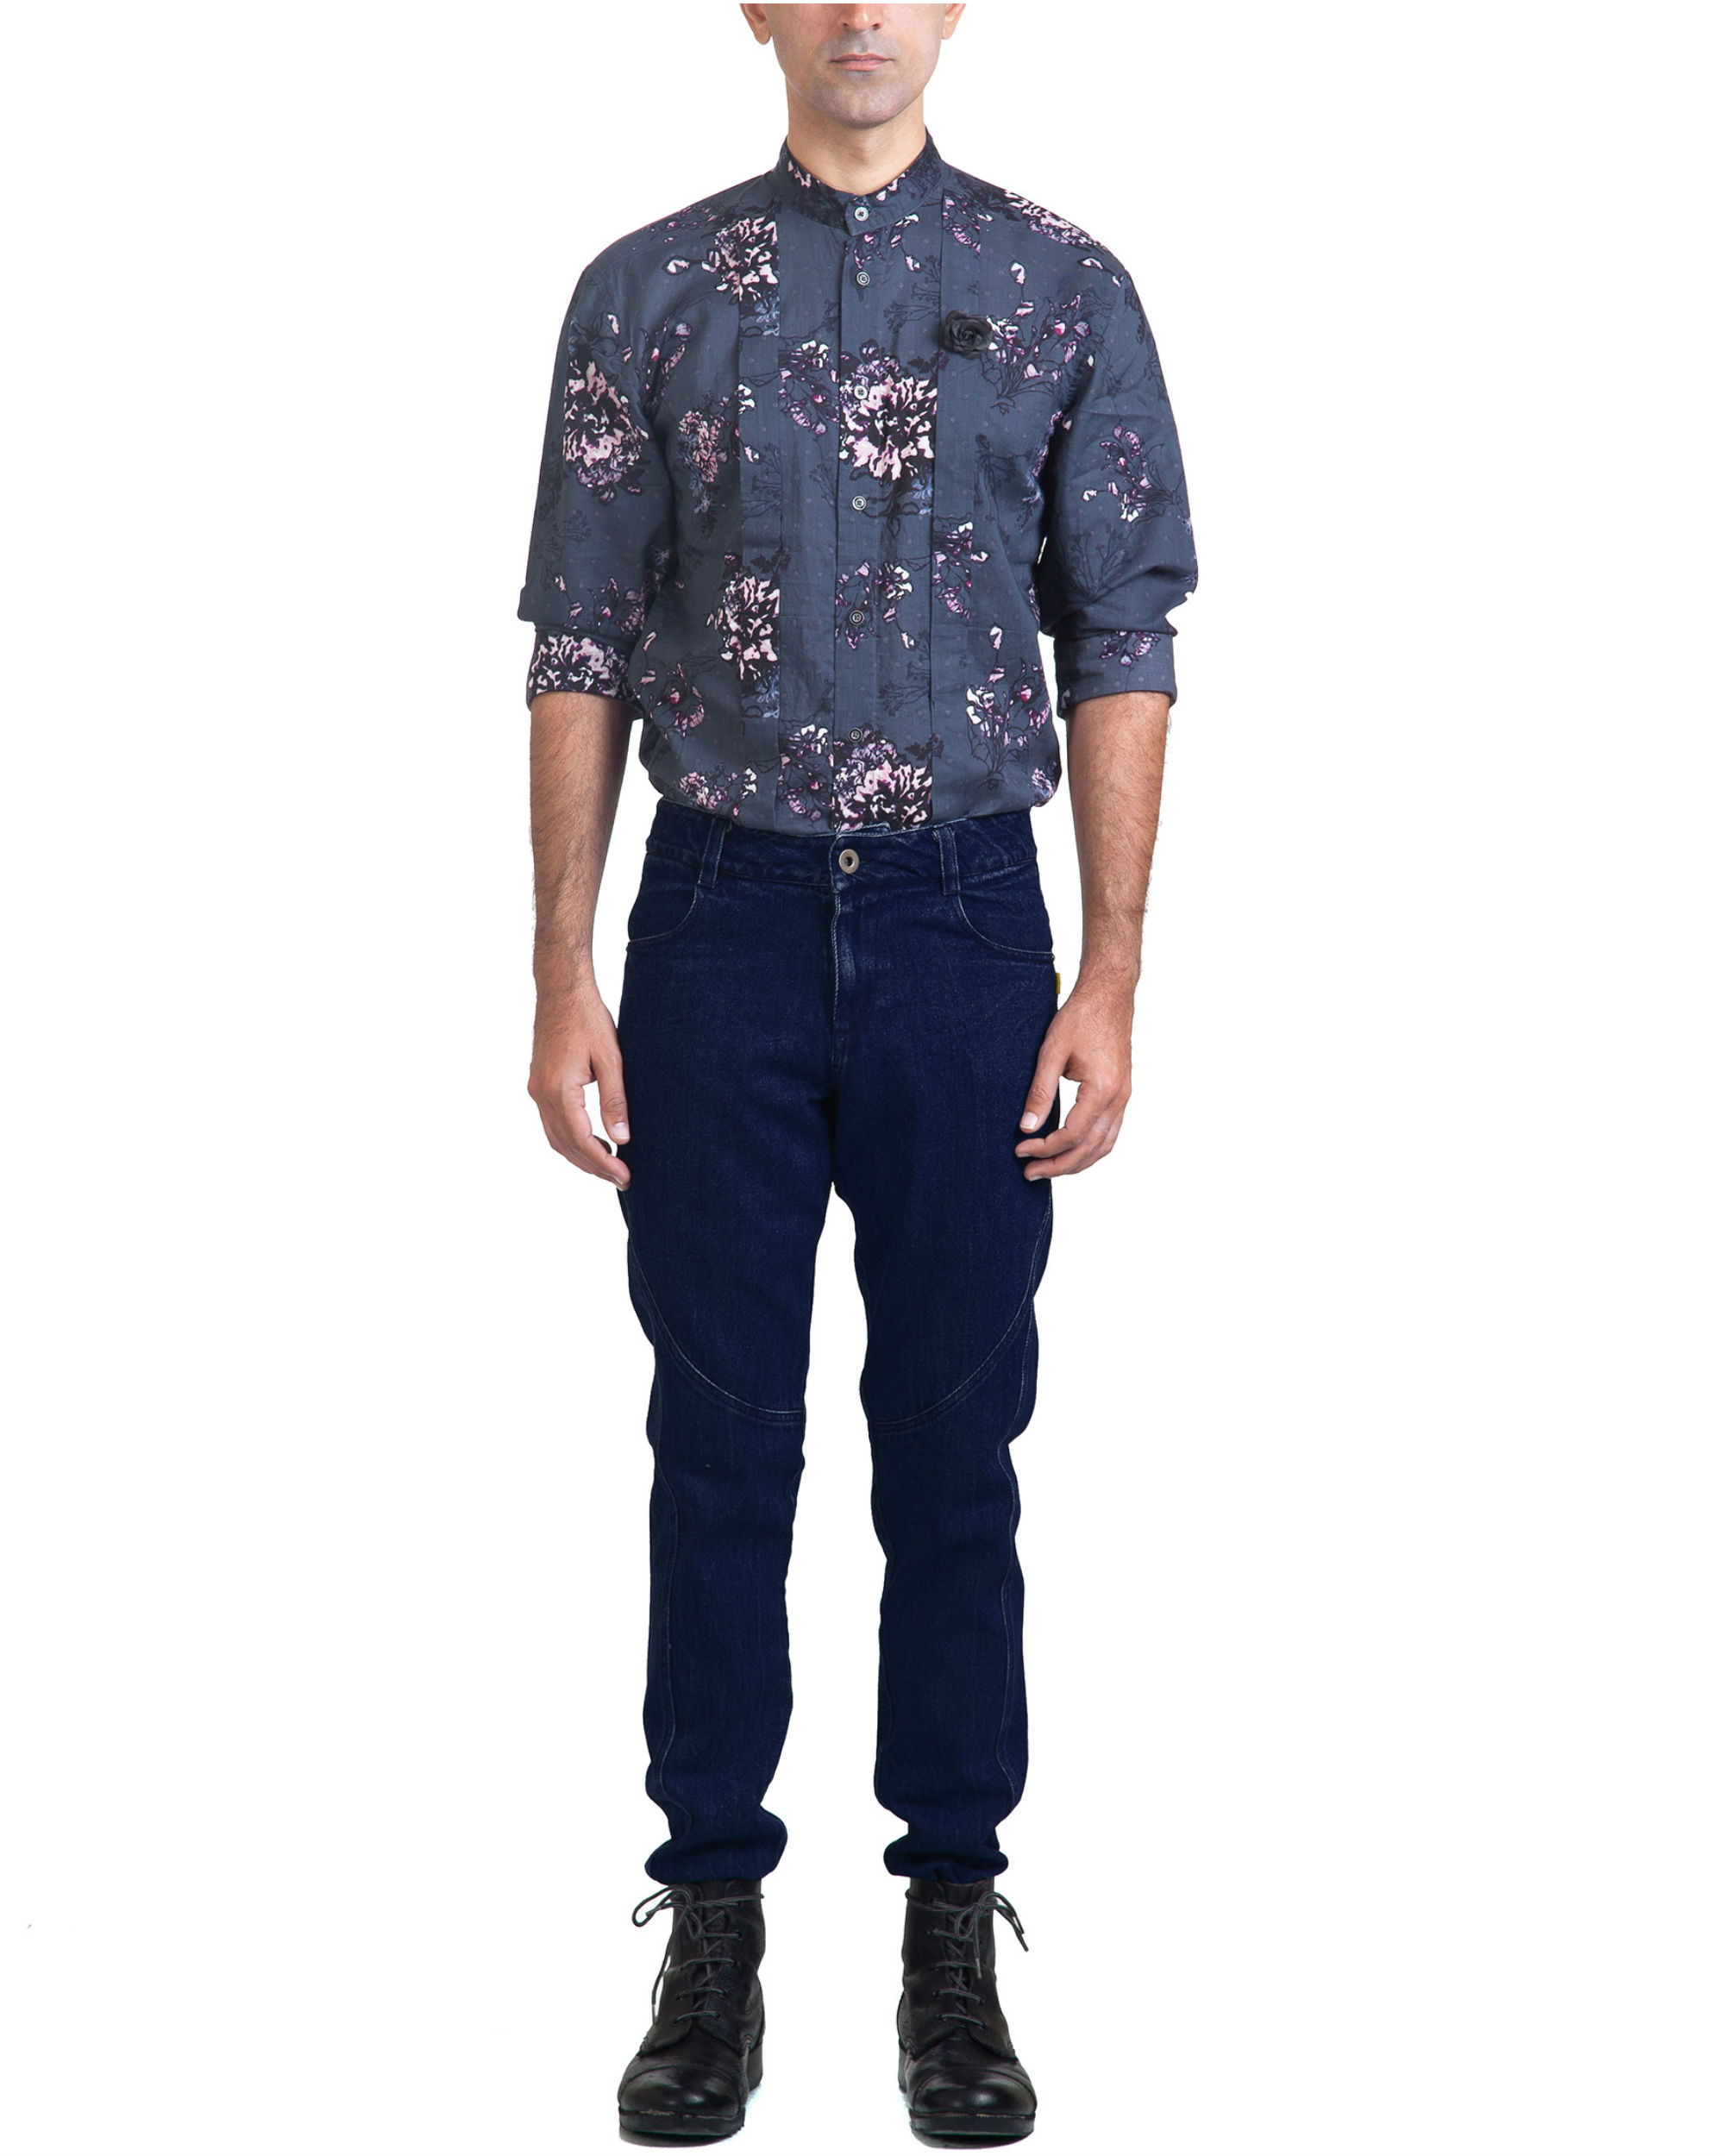 Indigo vintage jeans